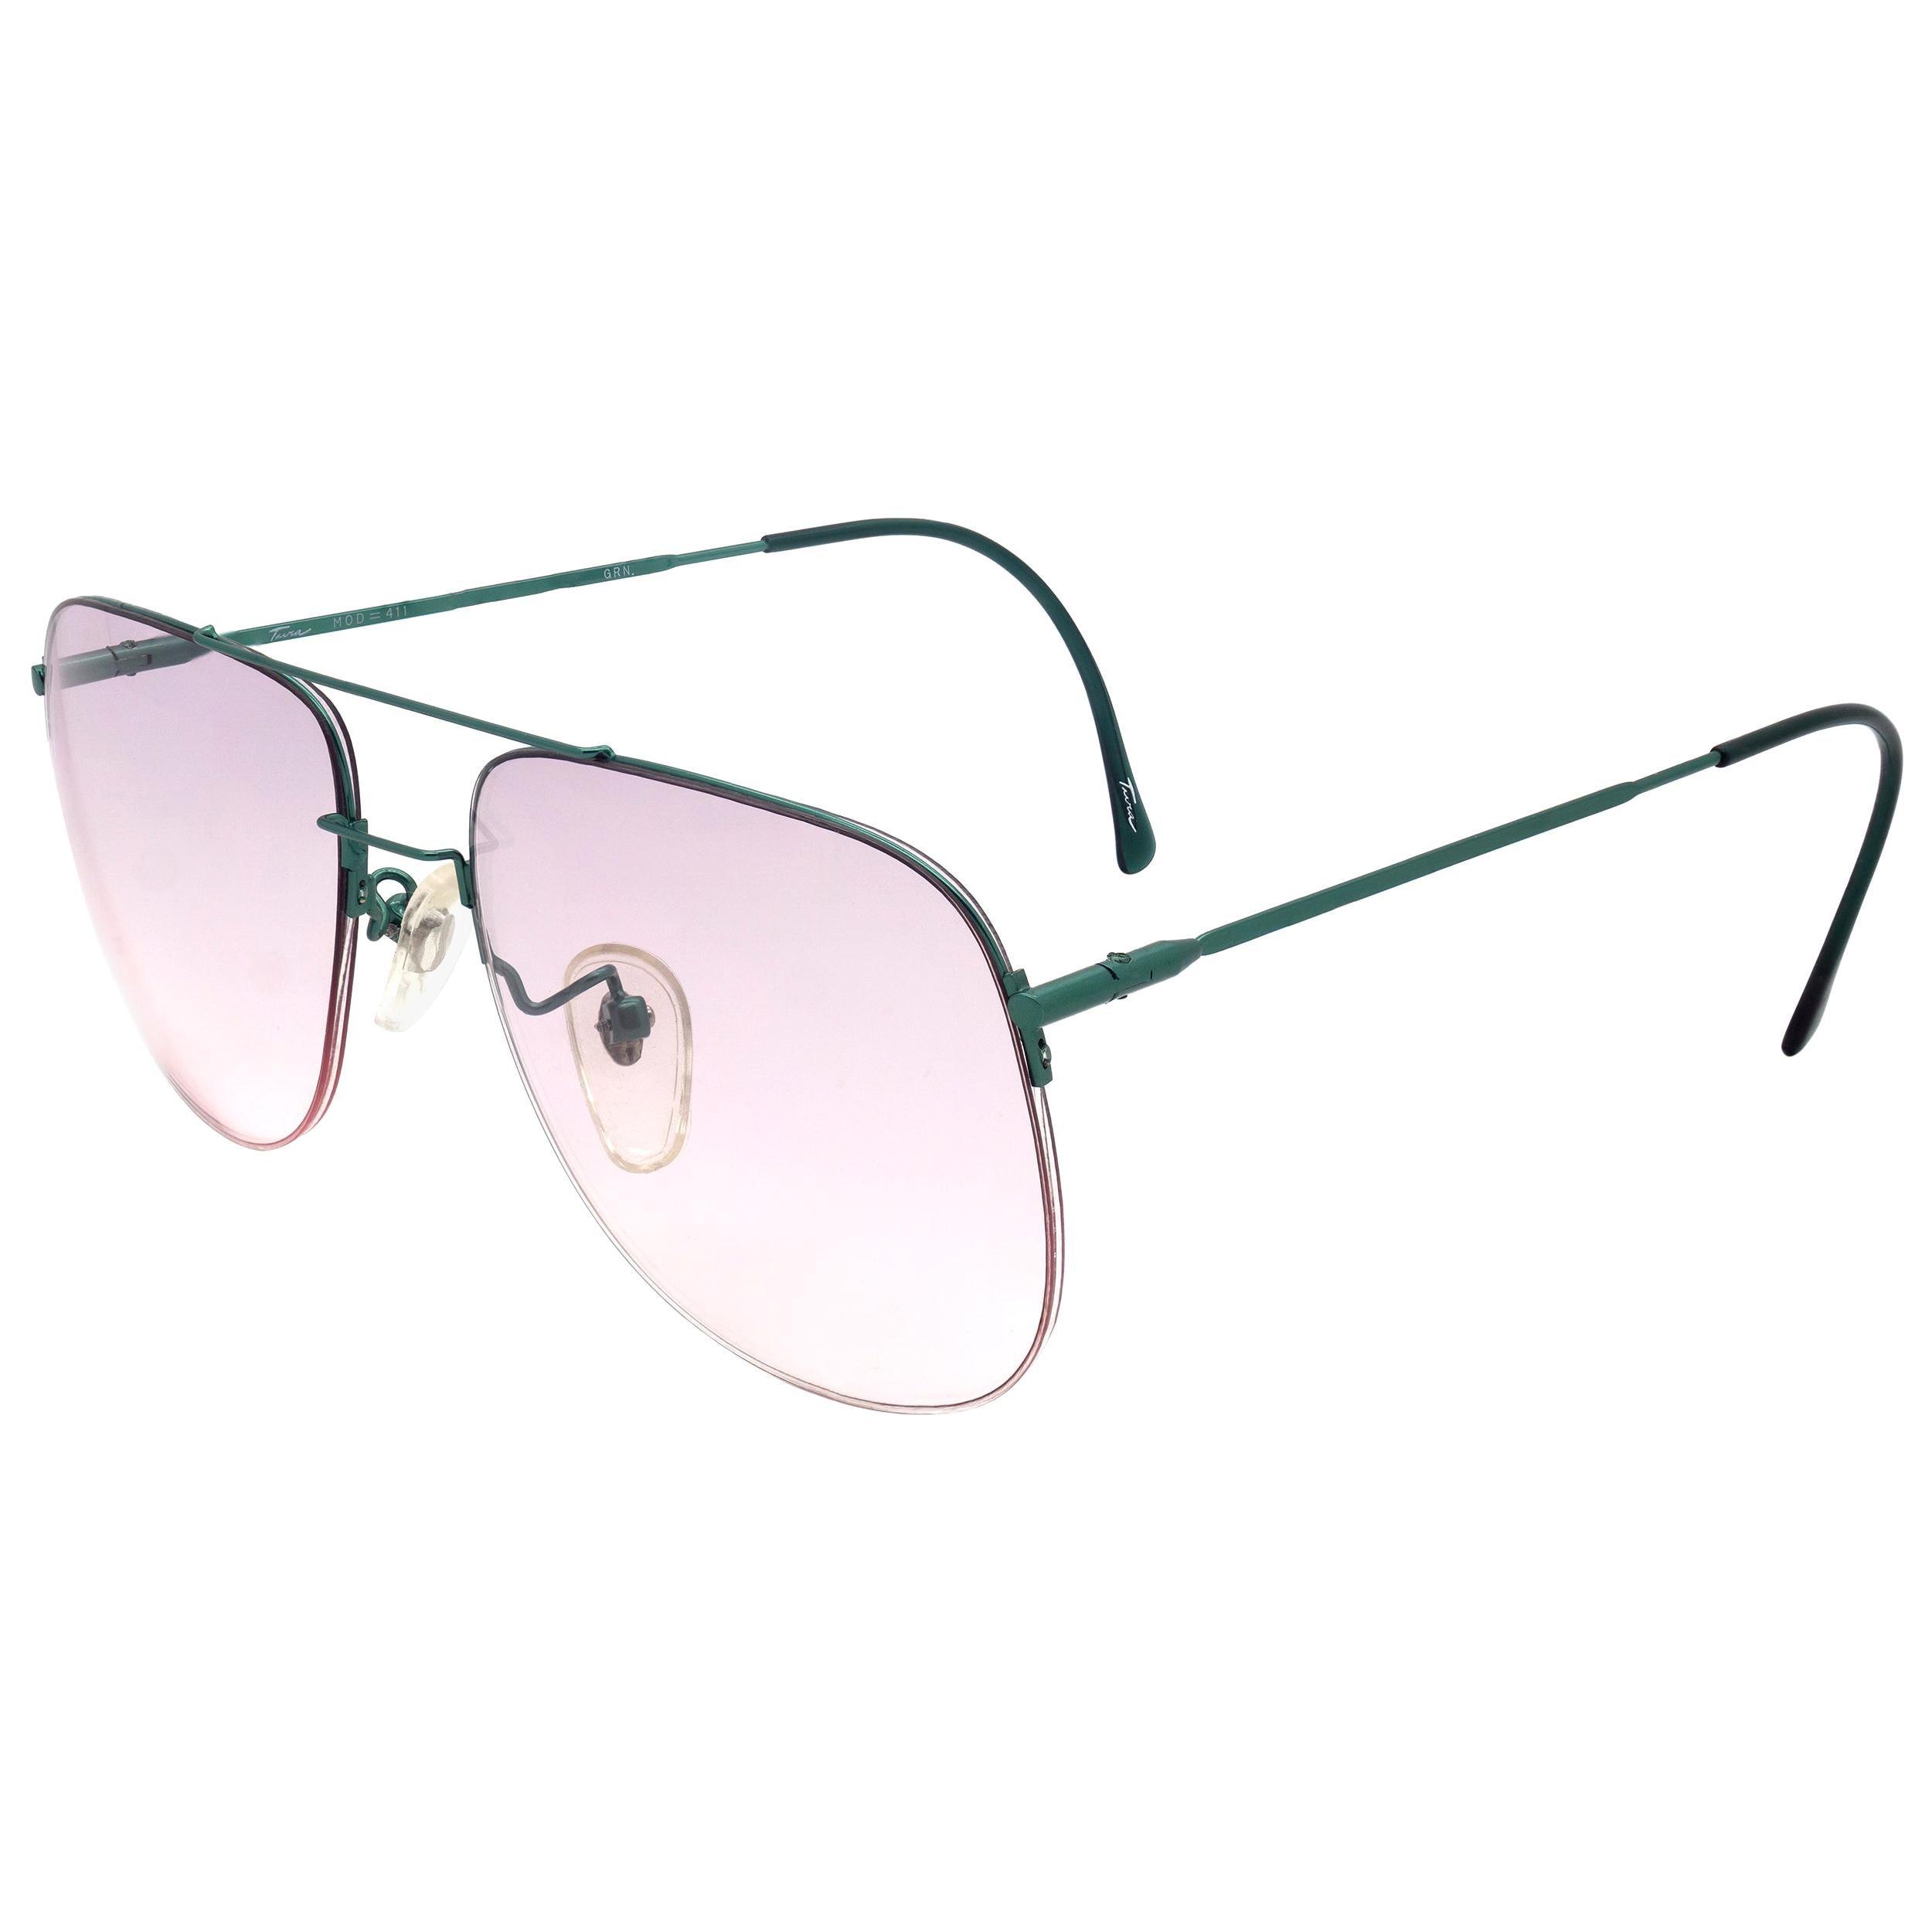 Tura vintage sunglasses, made in Japan. Green wire lightweight aviators unisex